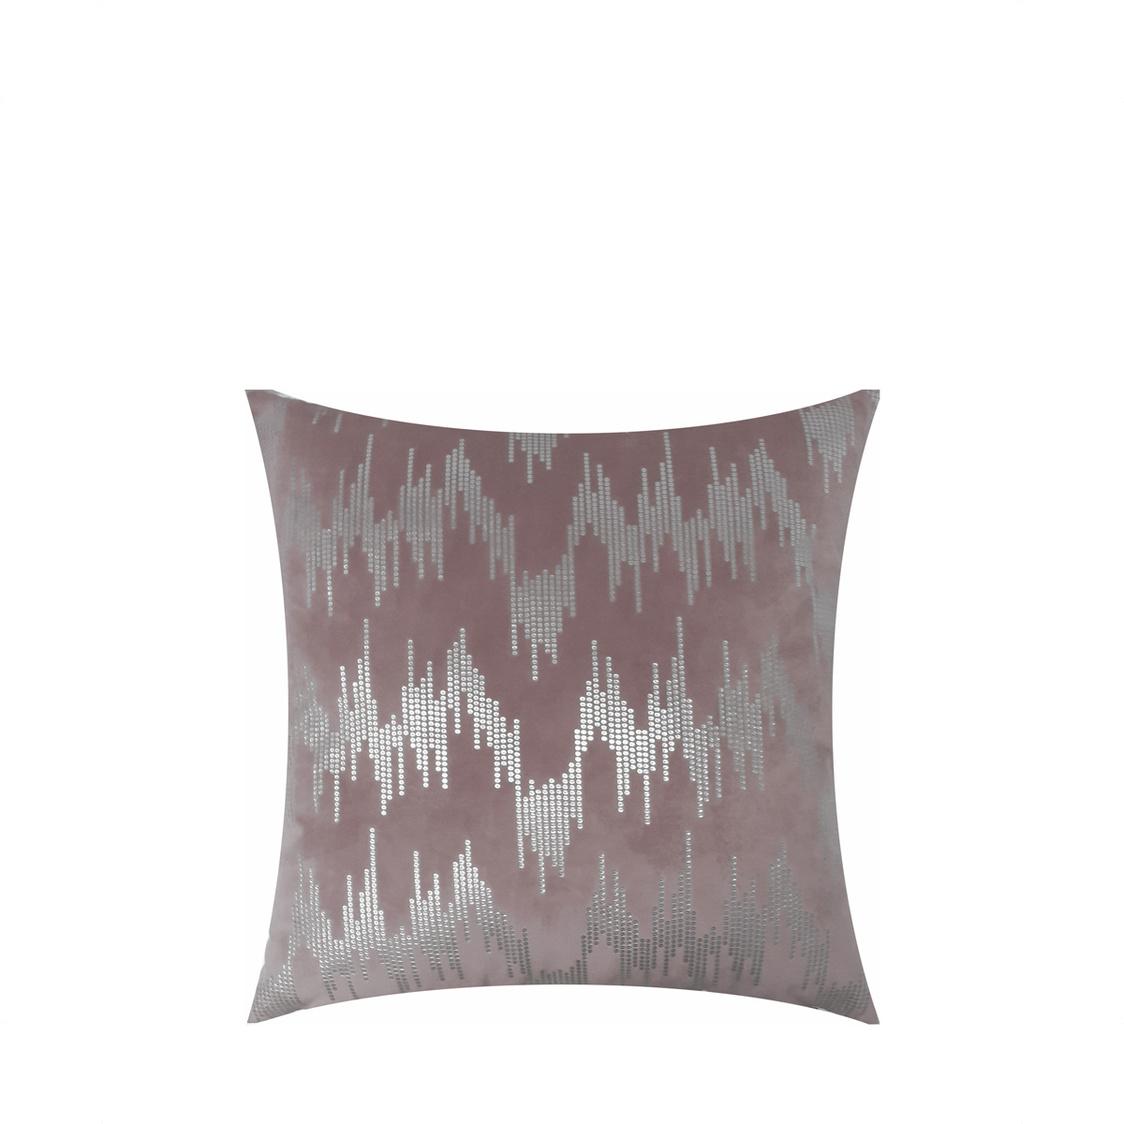 JRapee Wave Cushion Cover Pink 43x43cm